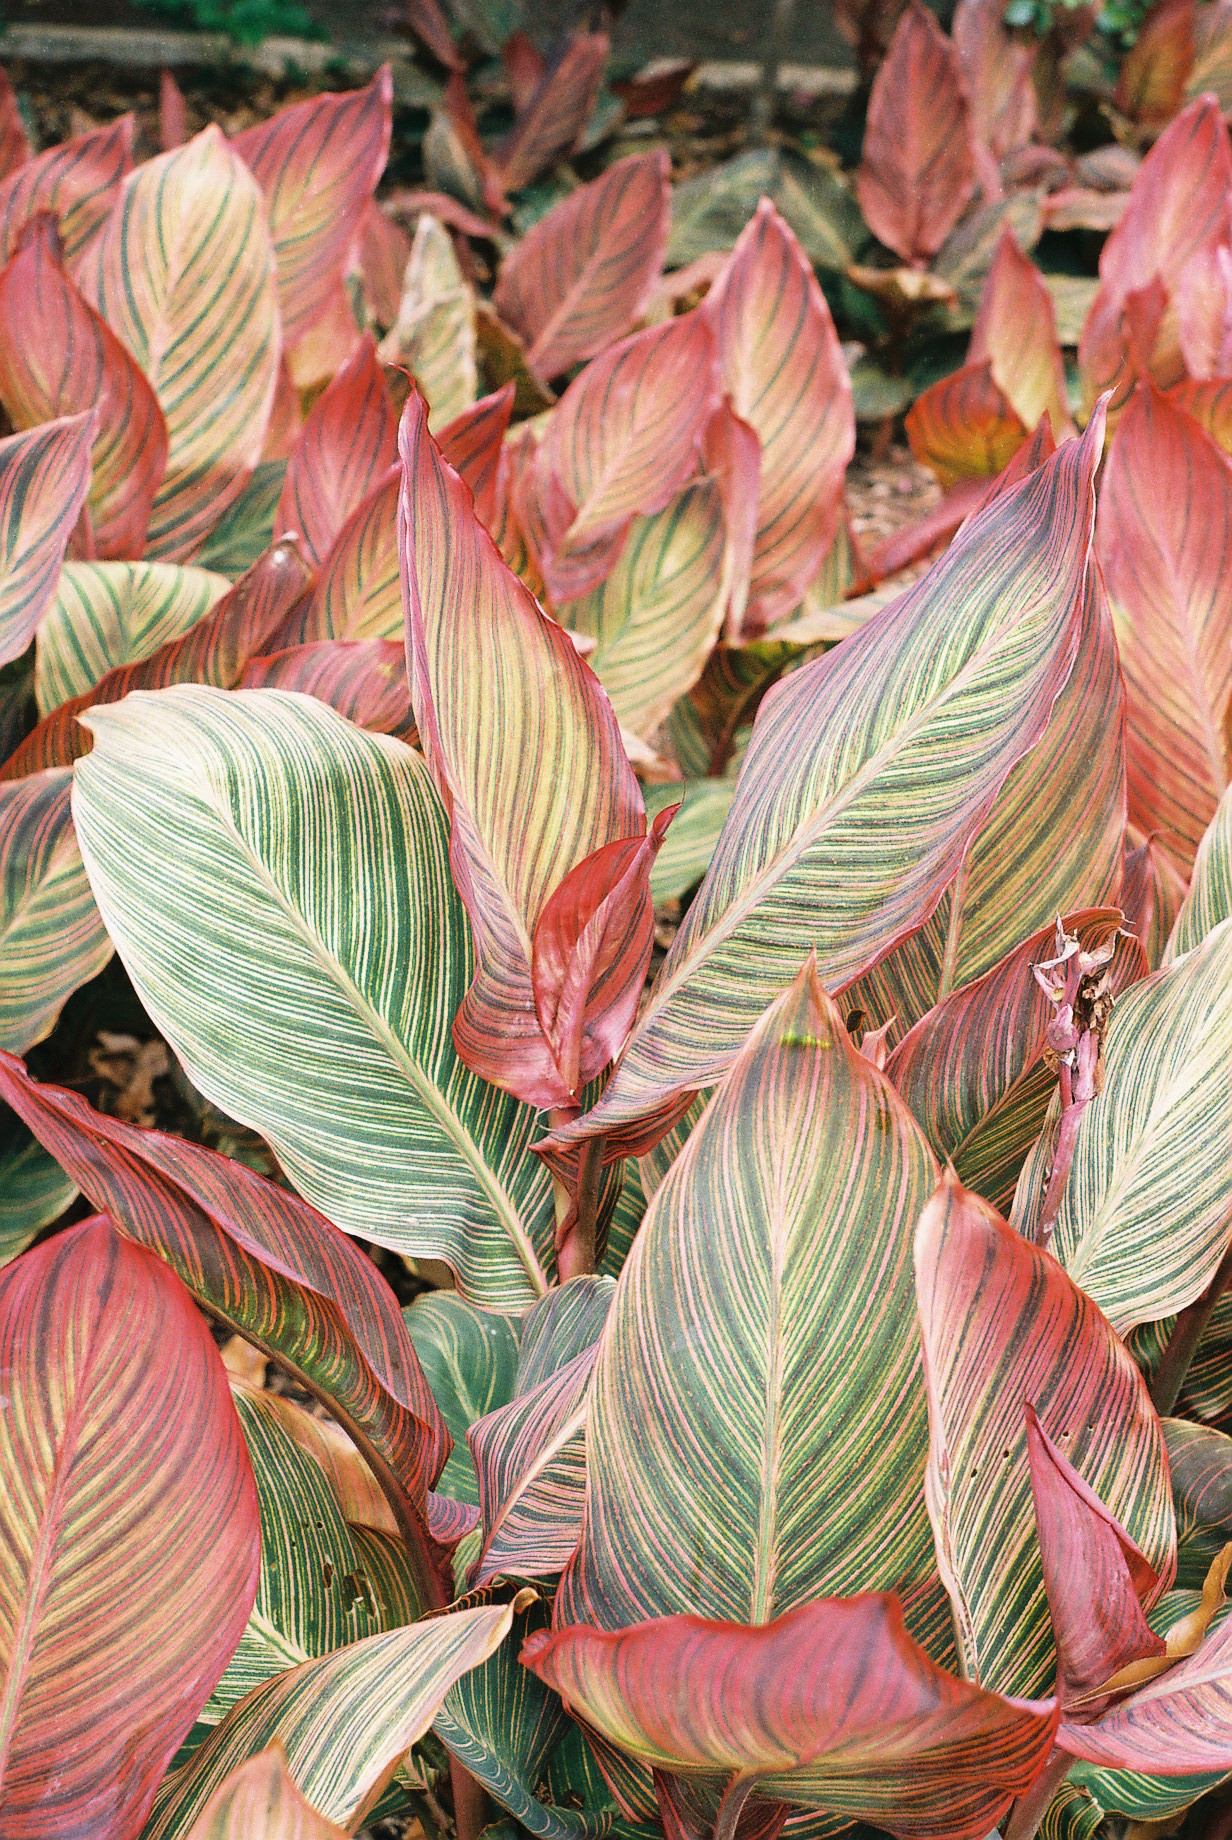 Brisbane Botanic Gardens Red Croton 35mm Film Travel Photographer